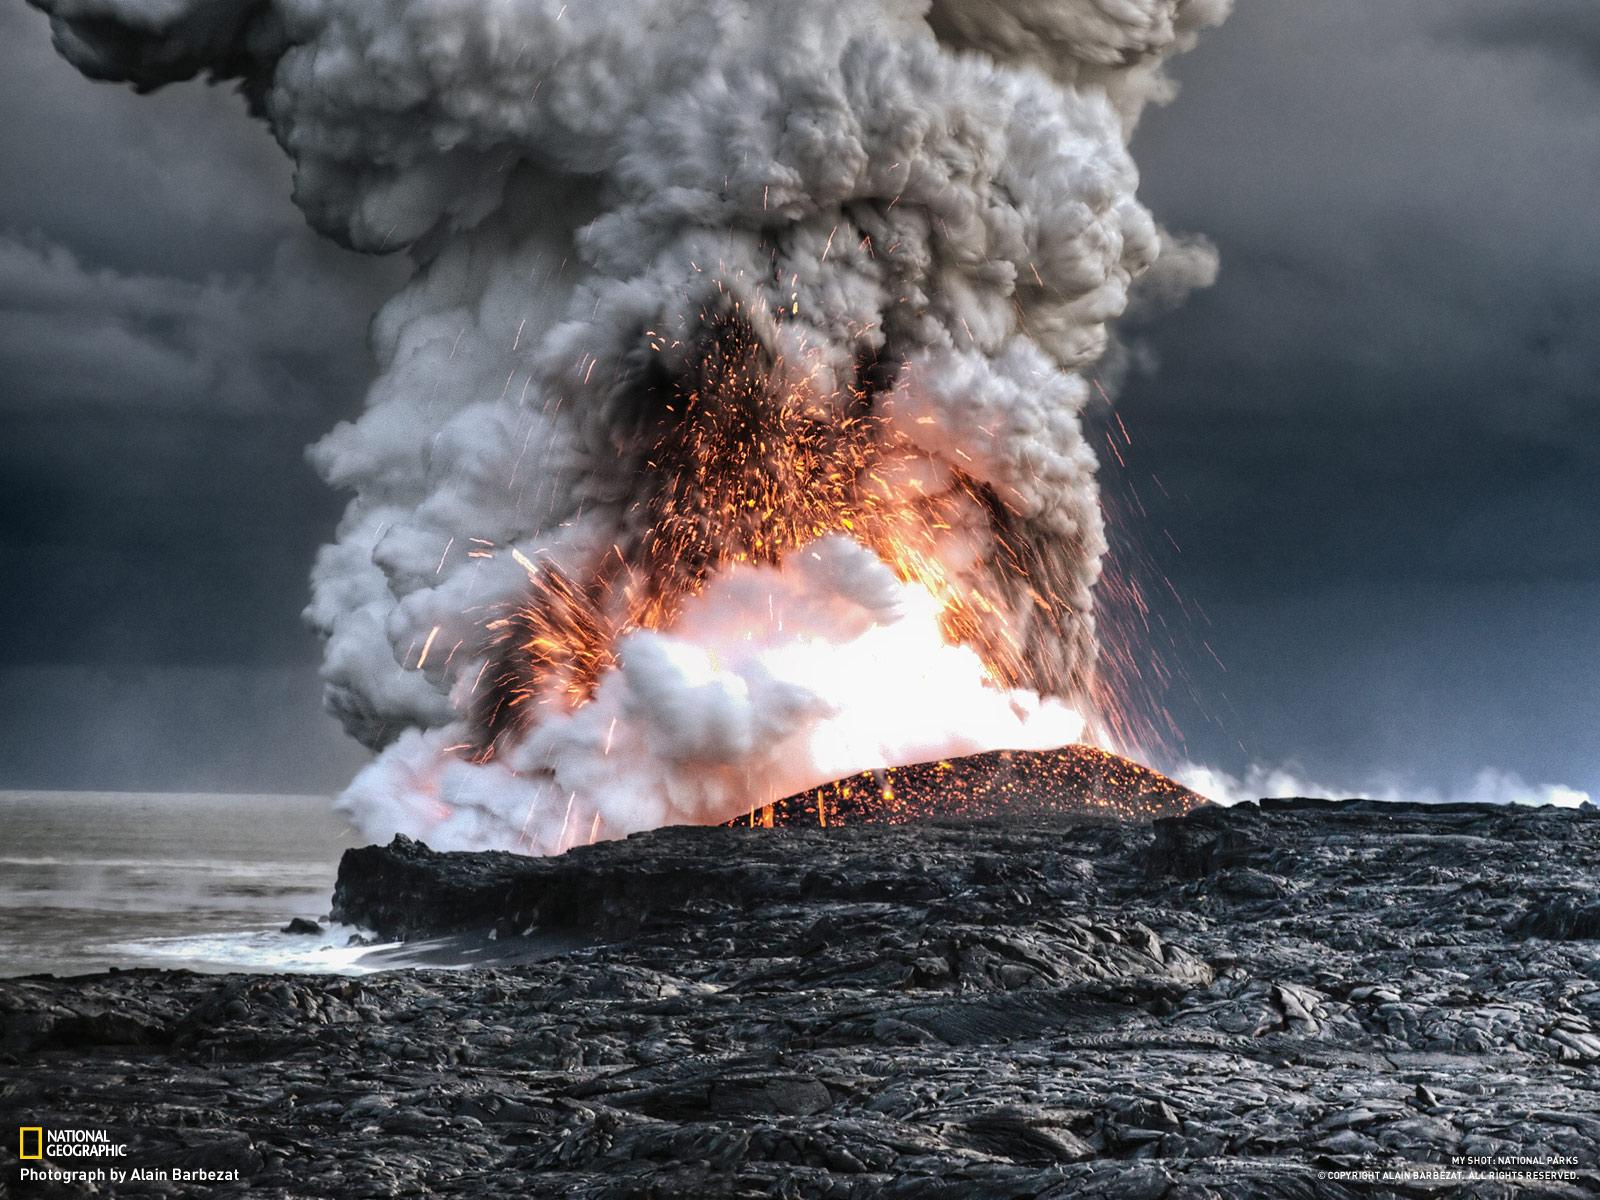 http://1.bp.blogspot.com/-ulu0z1f1KoI/Tcw_u1G2IXI/AAAAAAAABjM/bkmsOQOwyZE/s1600/volcano.jpg